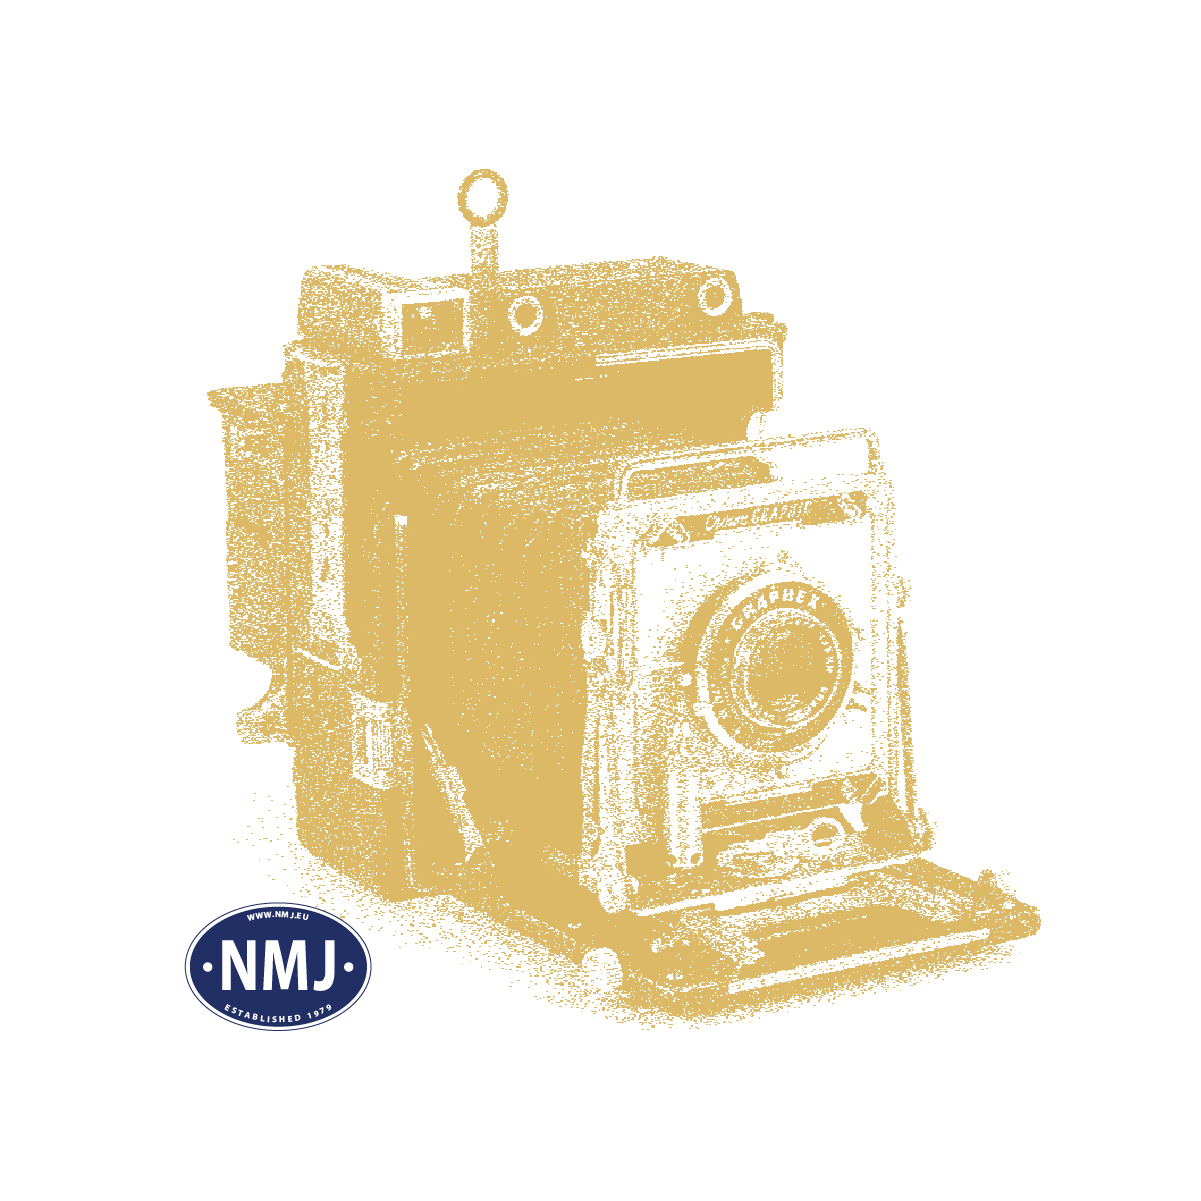 NMJT90604 - NMJ Topline CLR MY.1151, DCC m/ Sound